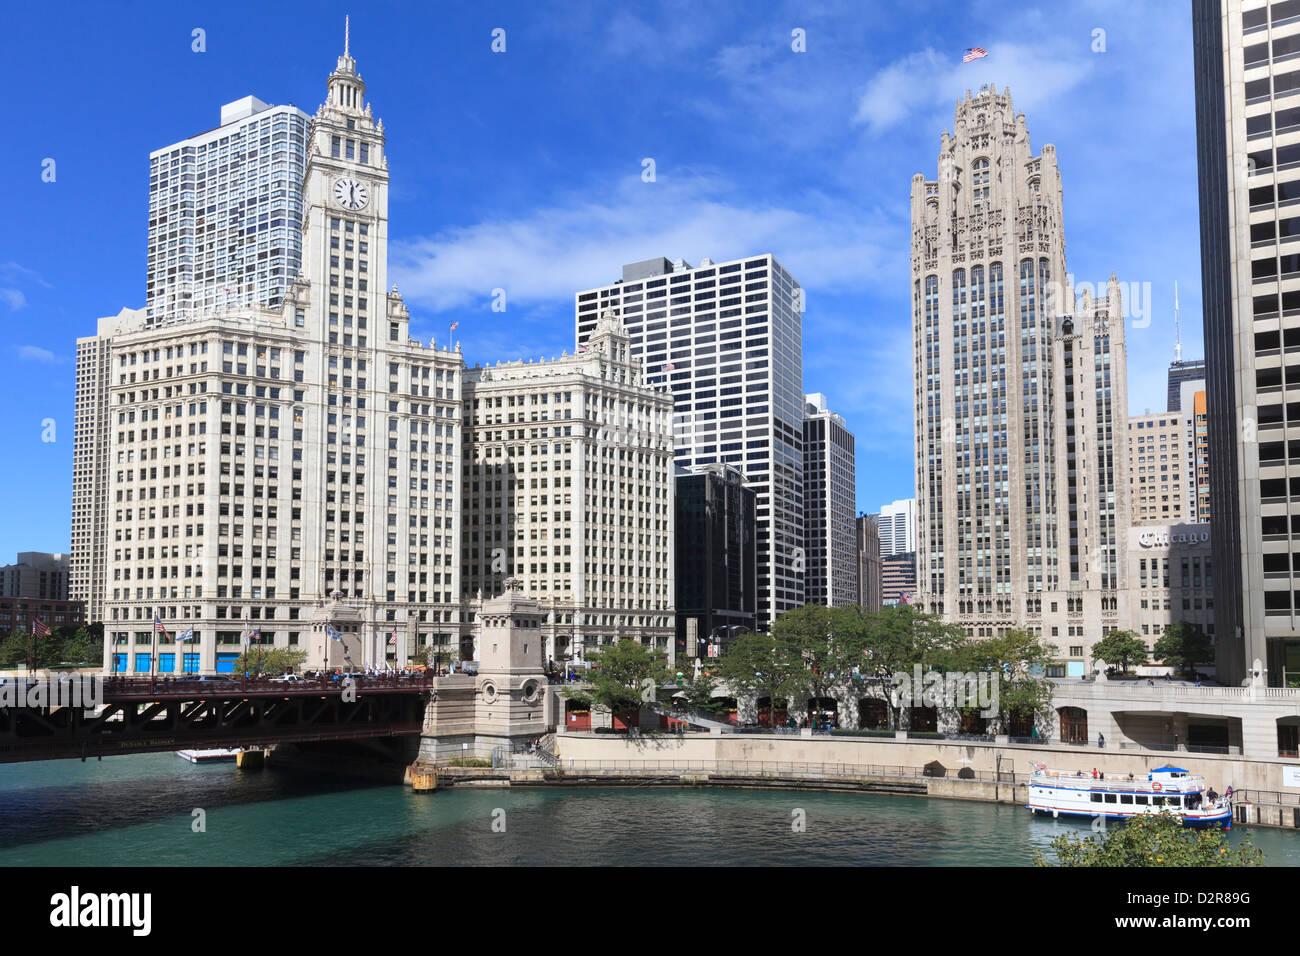 Das Wrigley Building und Tribune Tower, über den Chicago River, North Michigan Avenue, Chicago, Illinois, USA Stockfoto